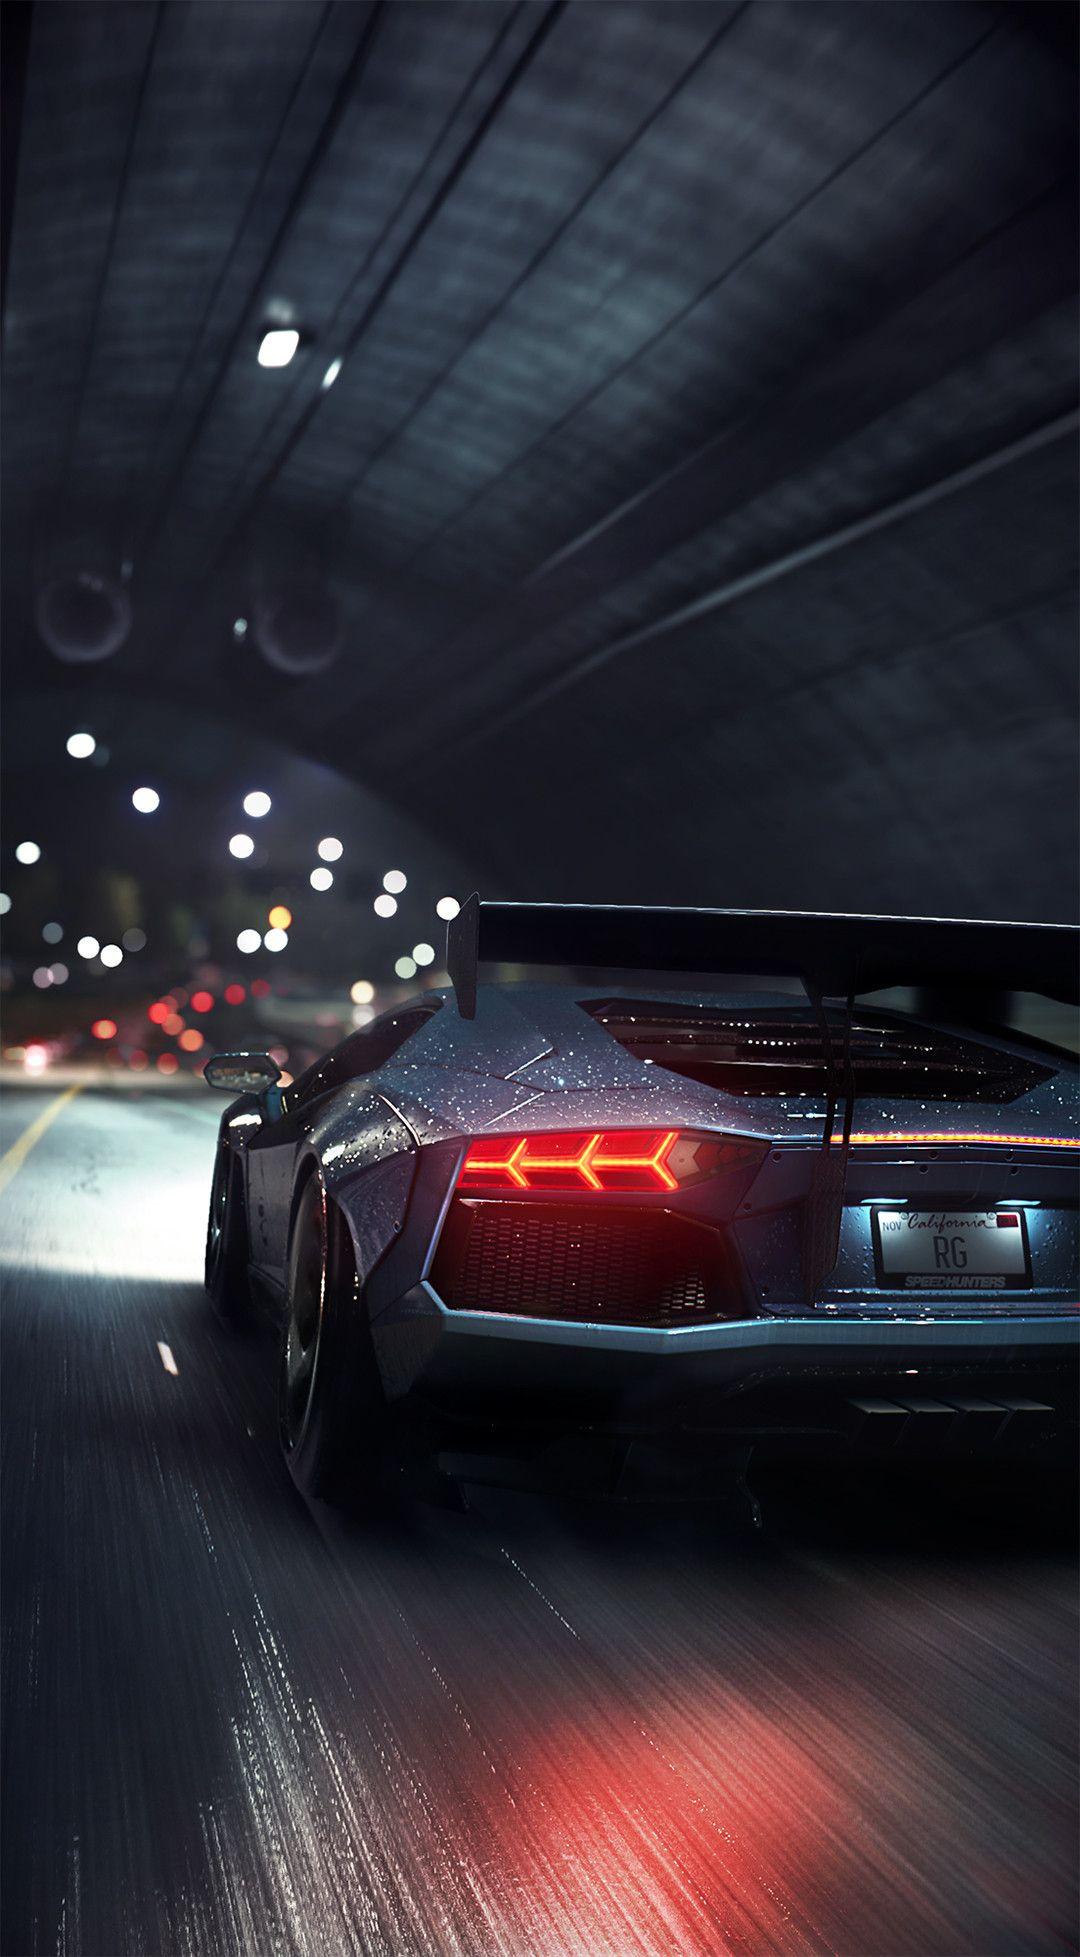 af368b08ed8e14b6b54eccfe51fc36de Breathtaking Lamborghini Countach Need for Speed Cars Trend